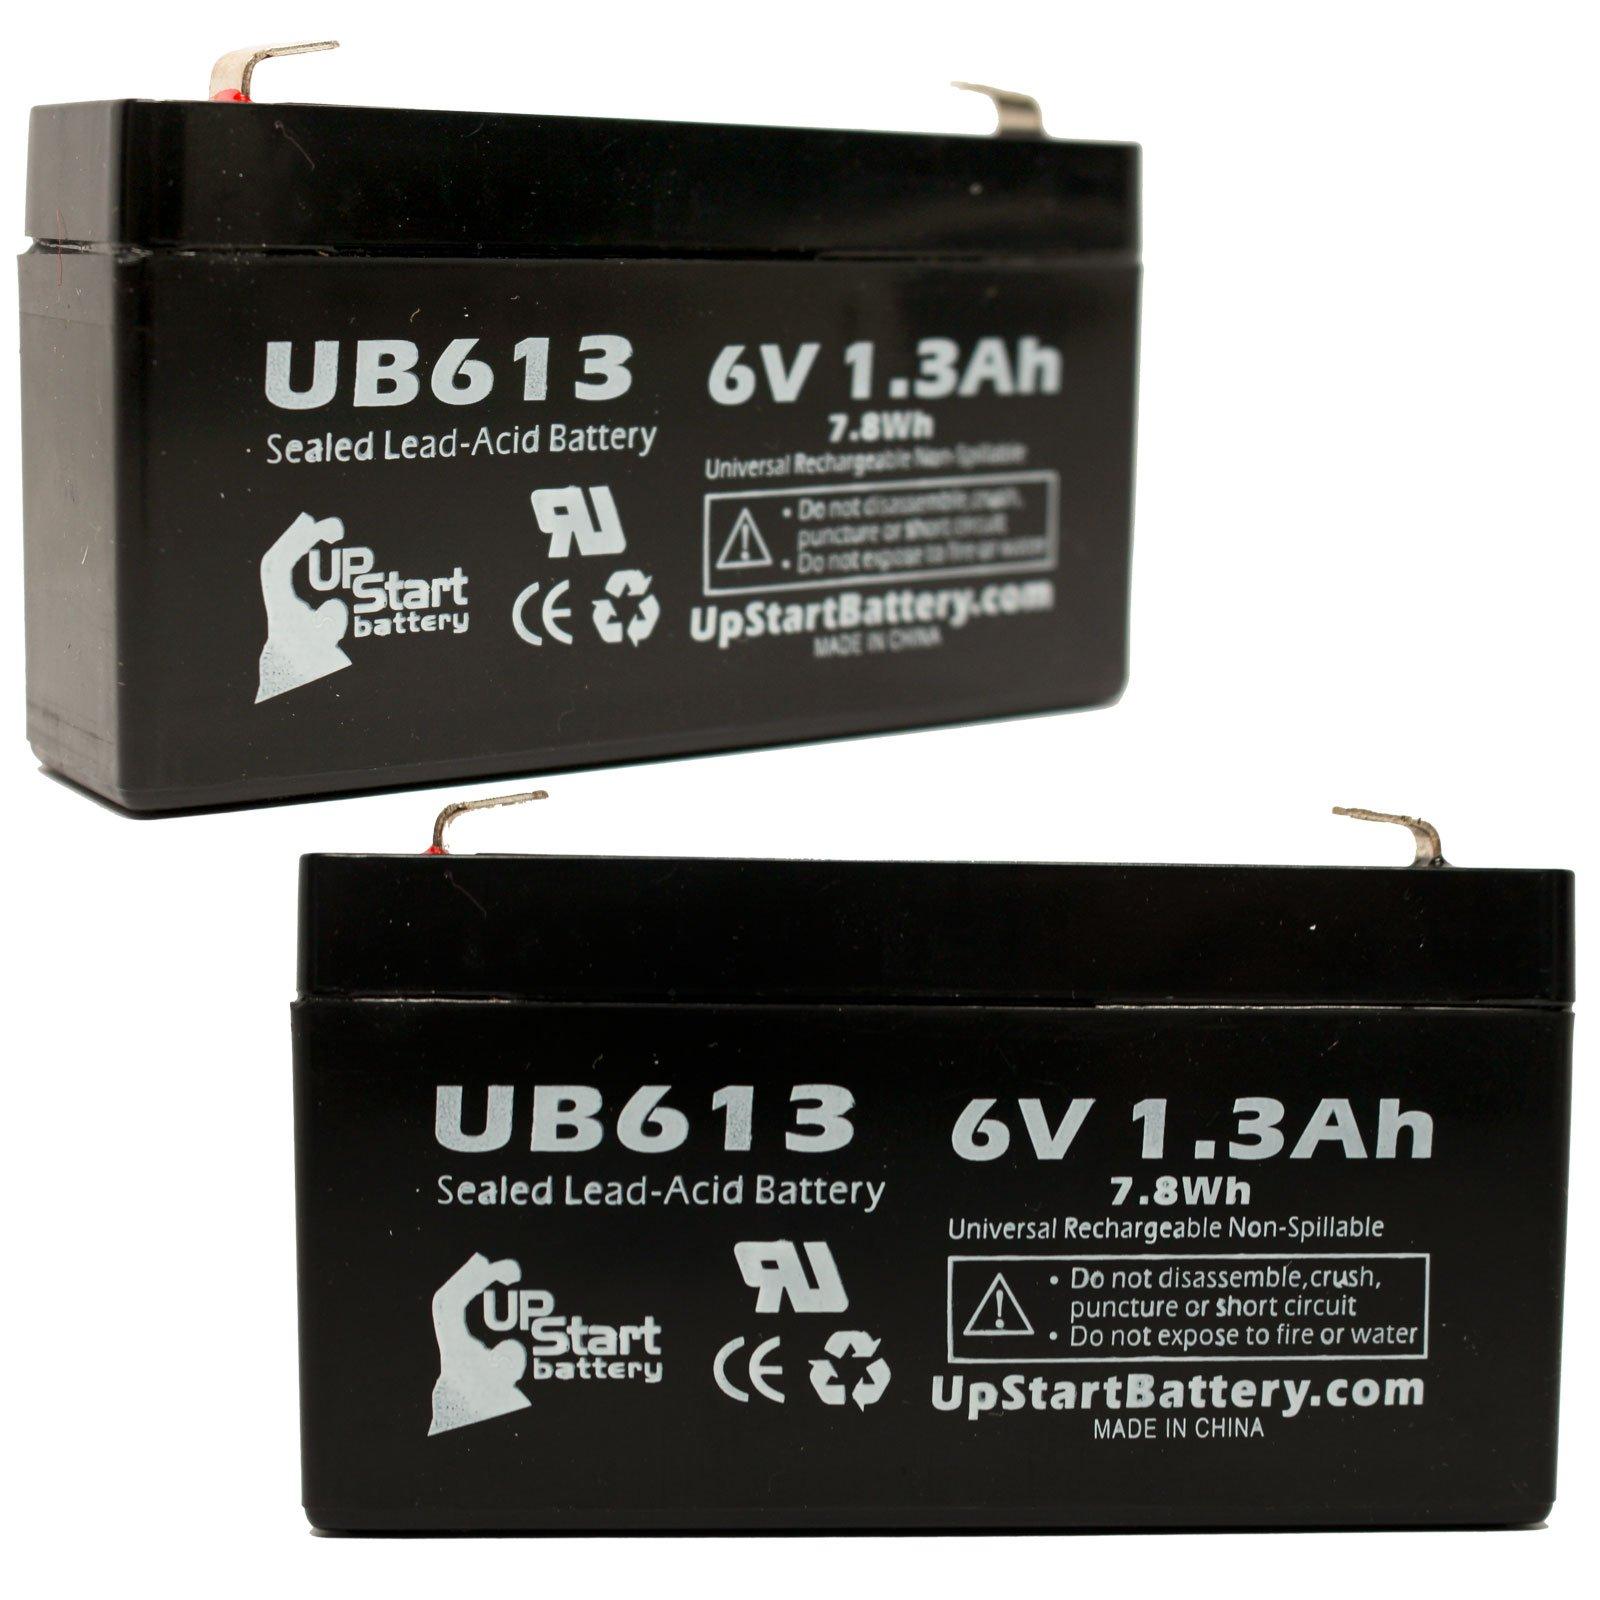 2x Pack - UB613 Universal Sealed Lead Acid Battery Replacement (6V, 1.3Ah, 1300mAh, F1 Terminal, AGM, SLA) - Includes 4 F1 to F2 Terminal Adapters - Compatible with LICHPOWER DJW6-12, Casil/Chee Yuen Industrial Ca613, Exitronix Ex6v1.2a, Lichpower Djw6-12, Lintronics Lcr6v1.3p, Toyo 3fm1.3, Tempest Tr1.2-6, B & B Battery Bp1.2-6, Werker Wka6-13f, Star Trac 800-3102, Leoch Djw6-1.2, Jasco Rb612